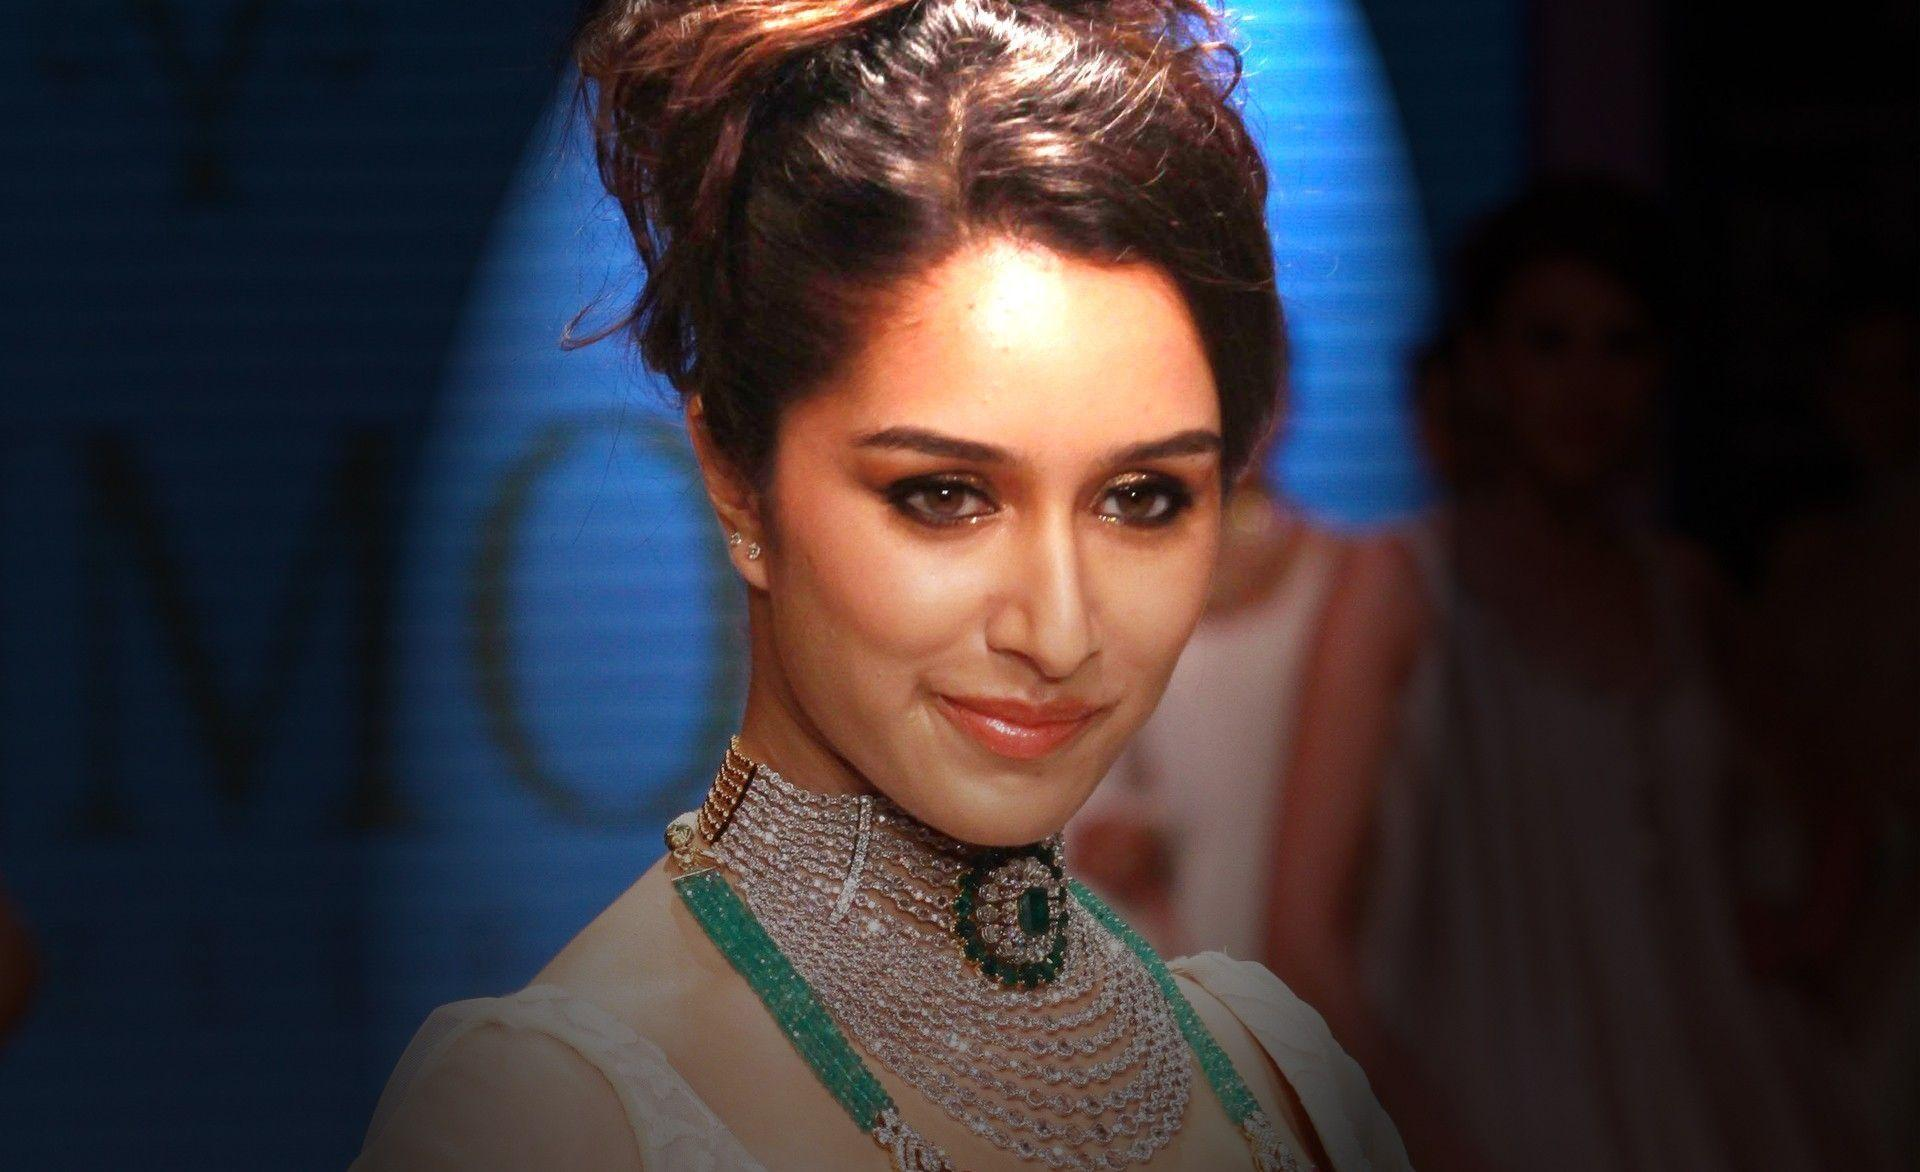 Download Shraddha Kapoor In Aashiqui 2 Movie Hd Wallpaper: Shraddha Kapoor Bhatt HD Wallpapers 1080p 2016